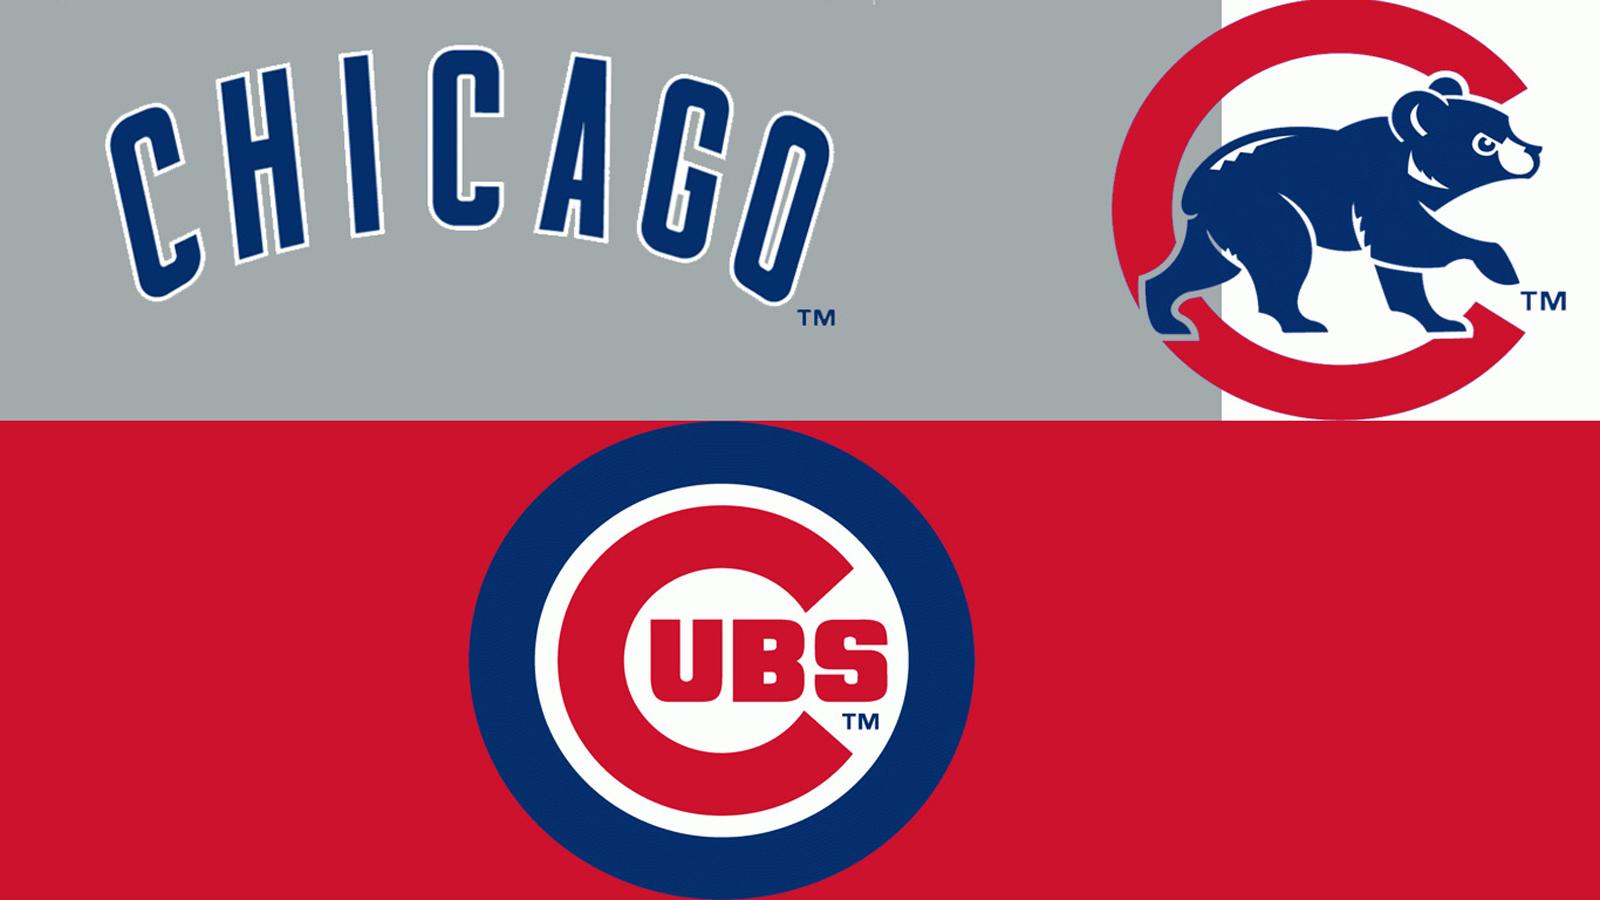 Chicago Cubs desktop wallpaper Chicago Cubs wallpapers 1600x900